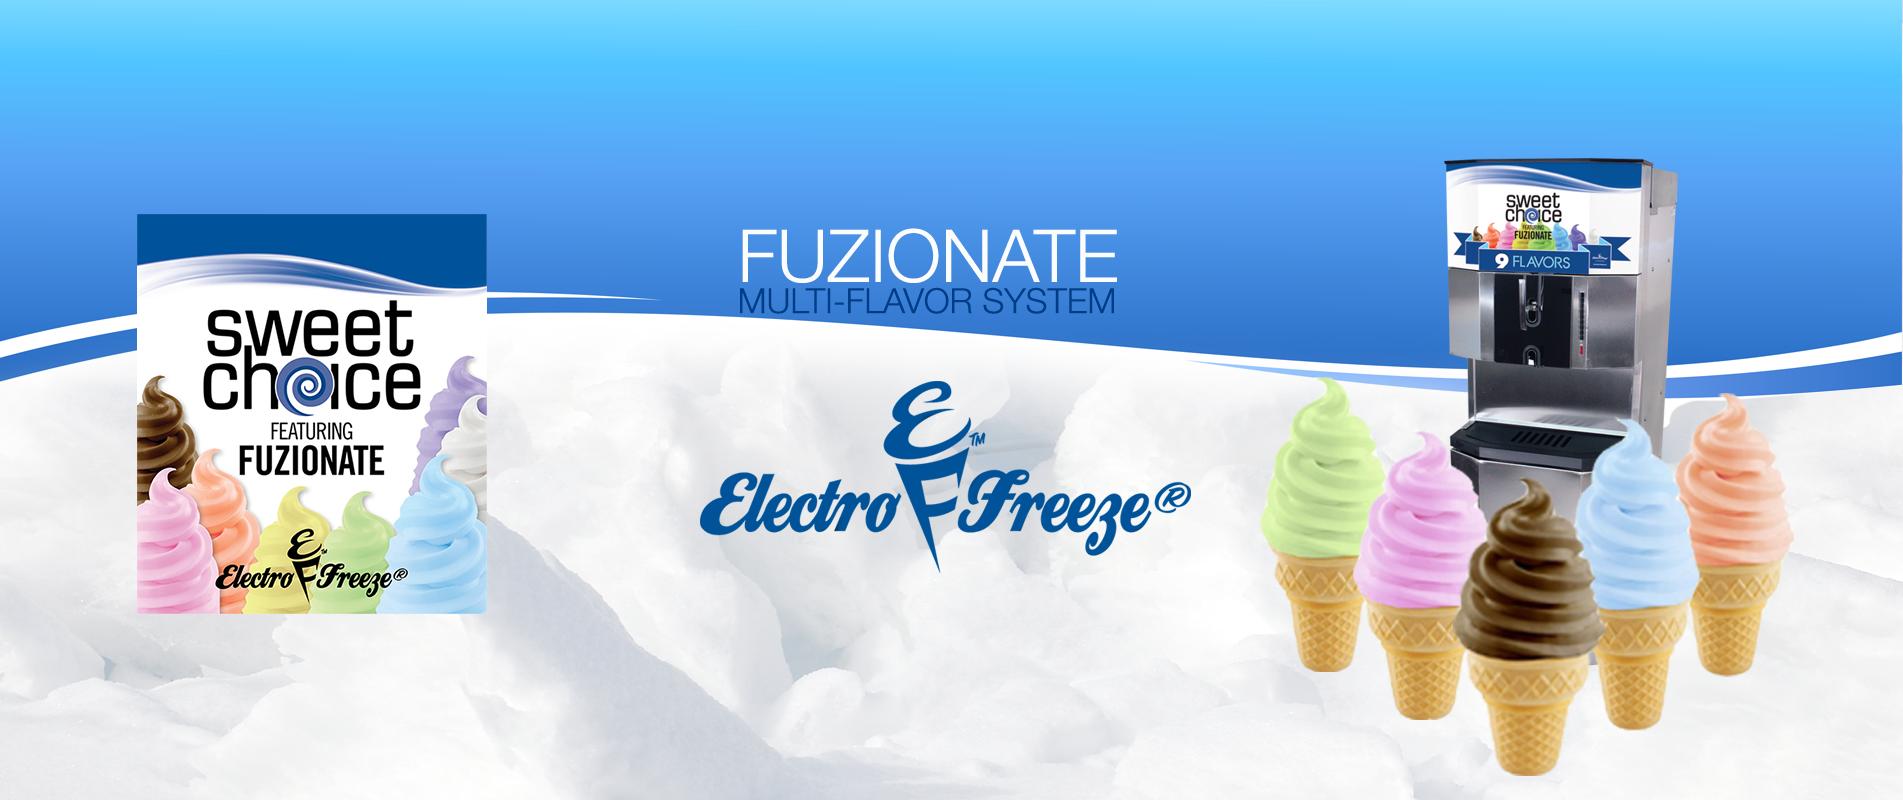 Electro Freeze Fuzionate Multi Flavor System